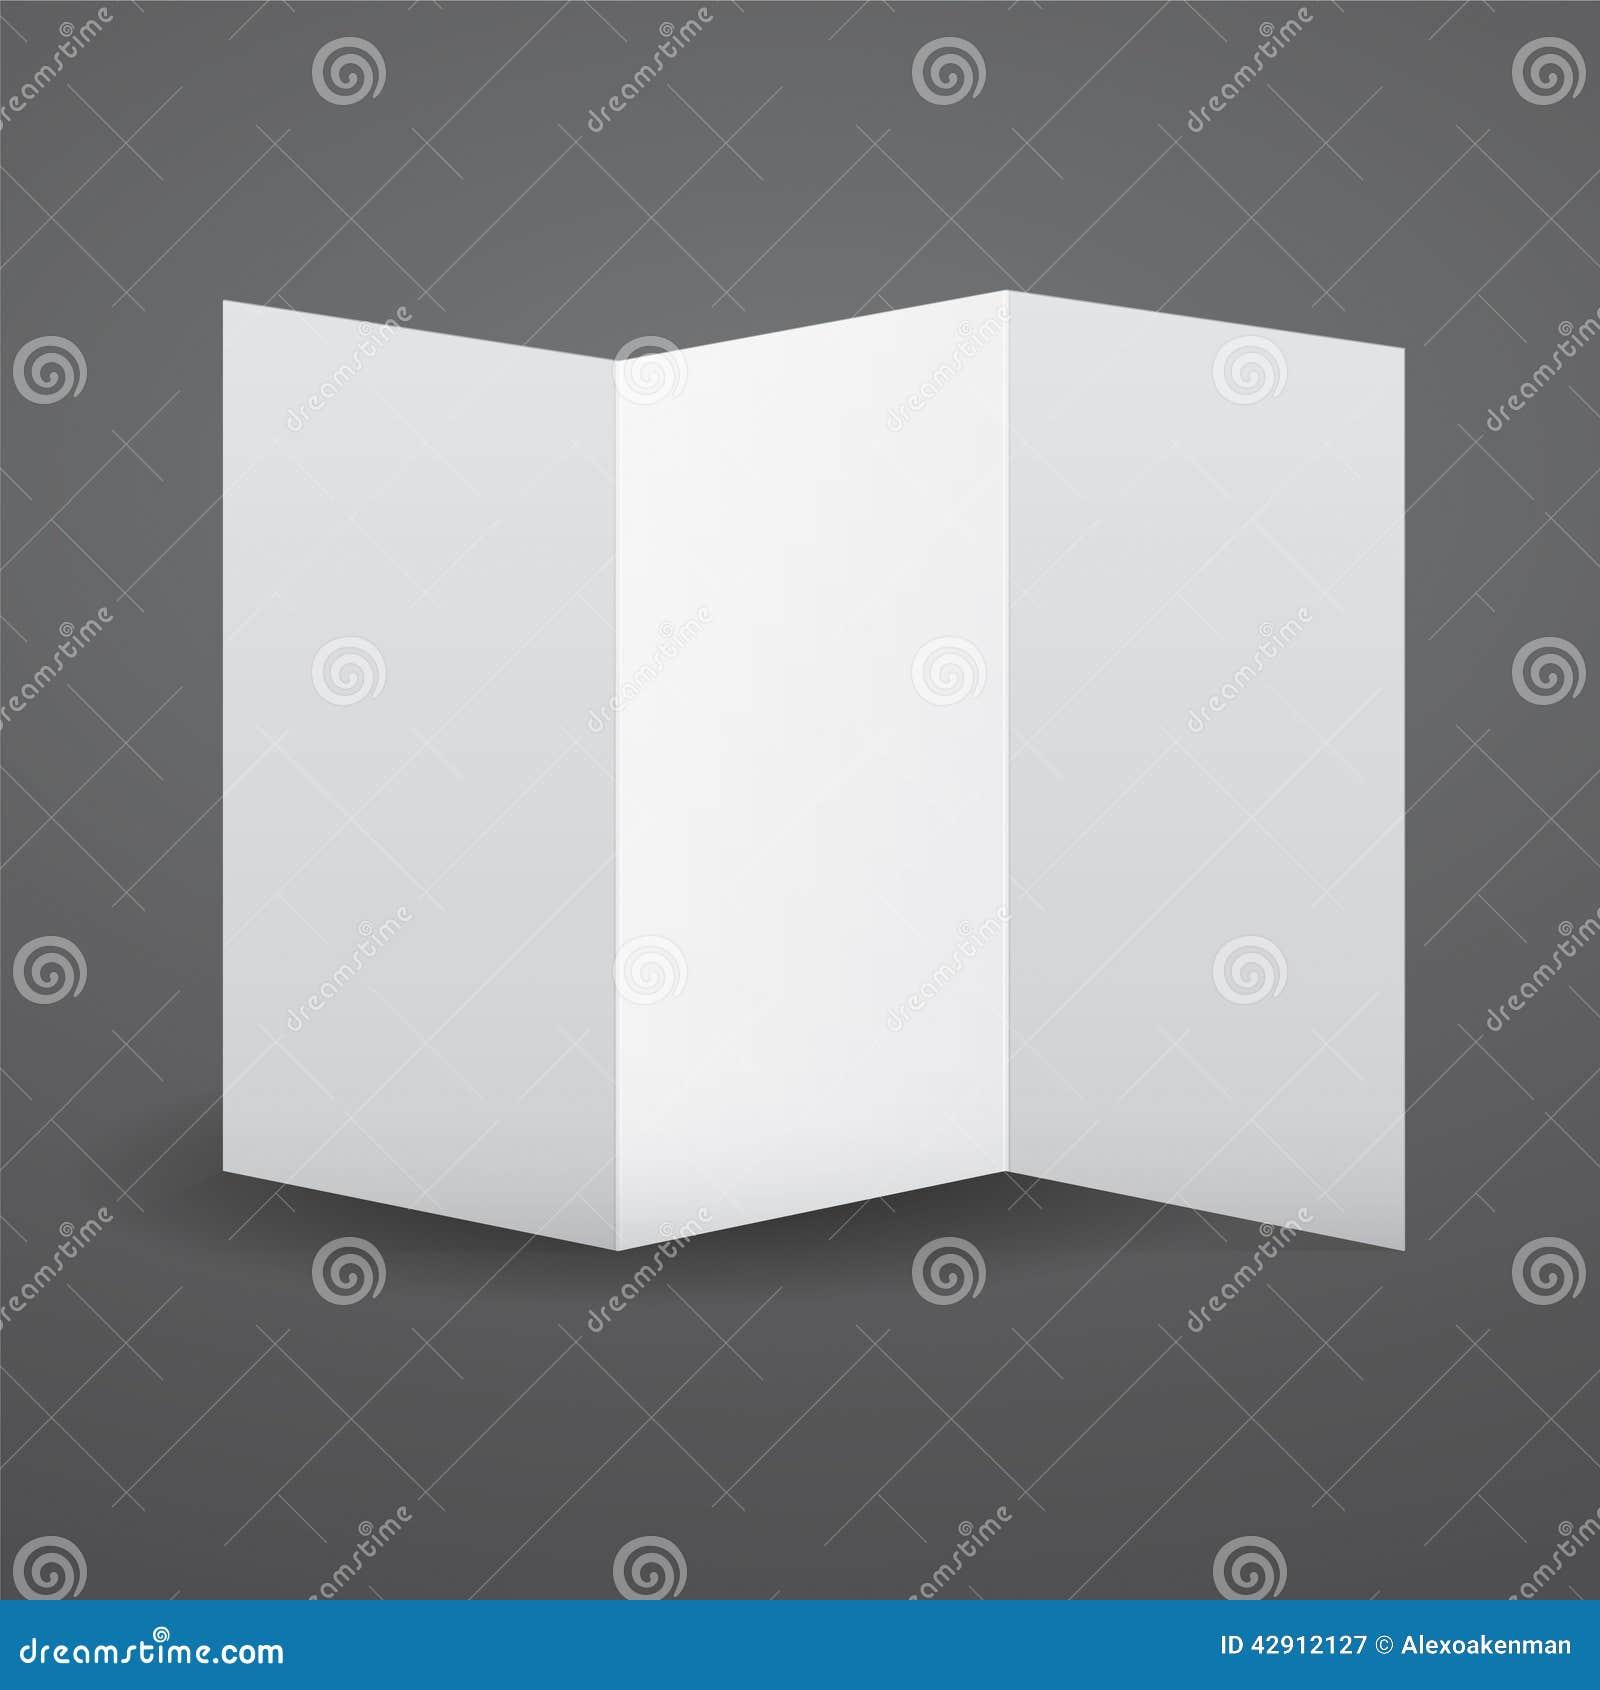 blank vector white tri fold brochure template stock vector image 42912127. Black Bedroom Furniture Sets. Home Design Ideas